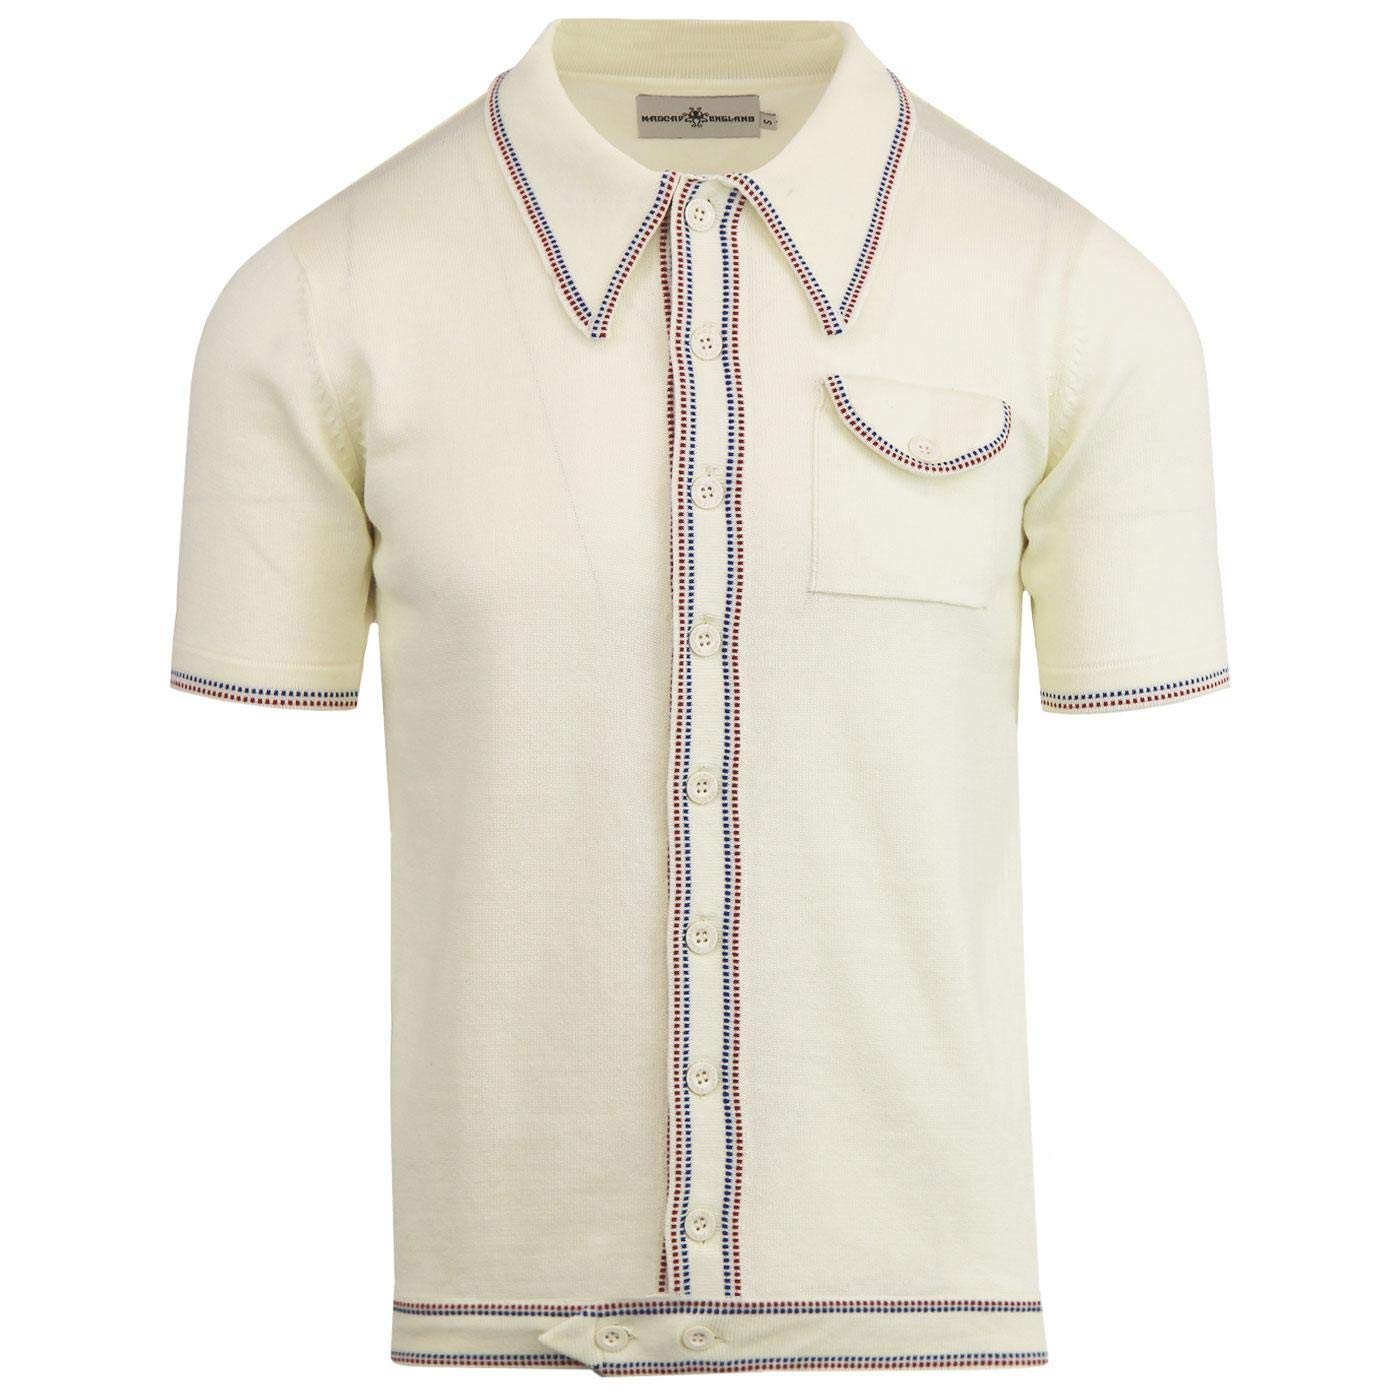 Retro Clothing for Men | Vintage Men's Fashion Madcap England Crawdaddy Micro Dash Knit Polo Caramel MC166 £34.99 AT vintagedancer.com